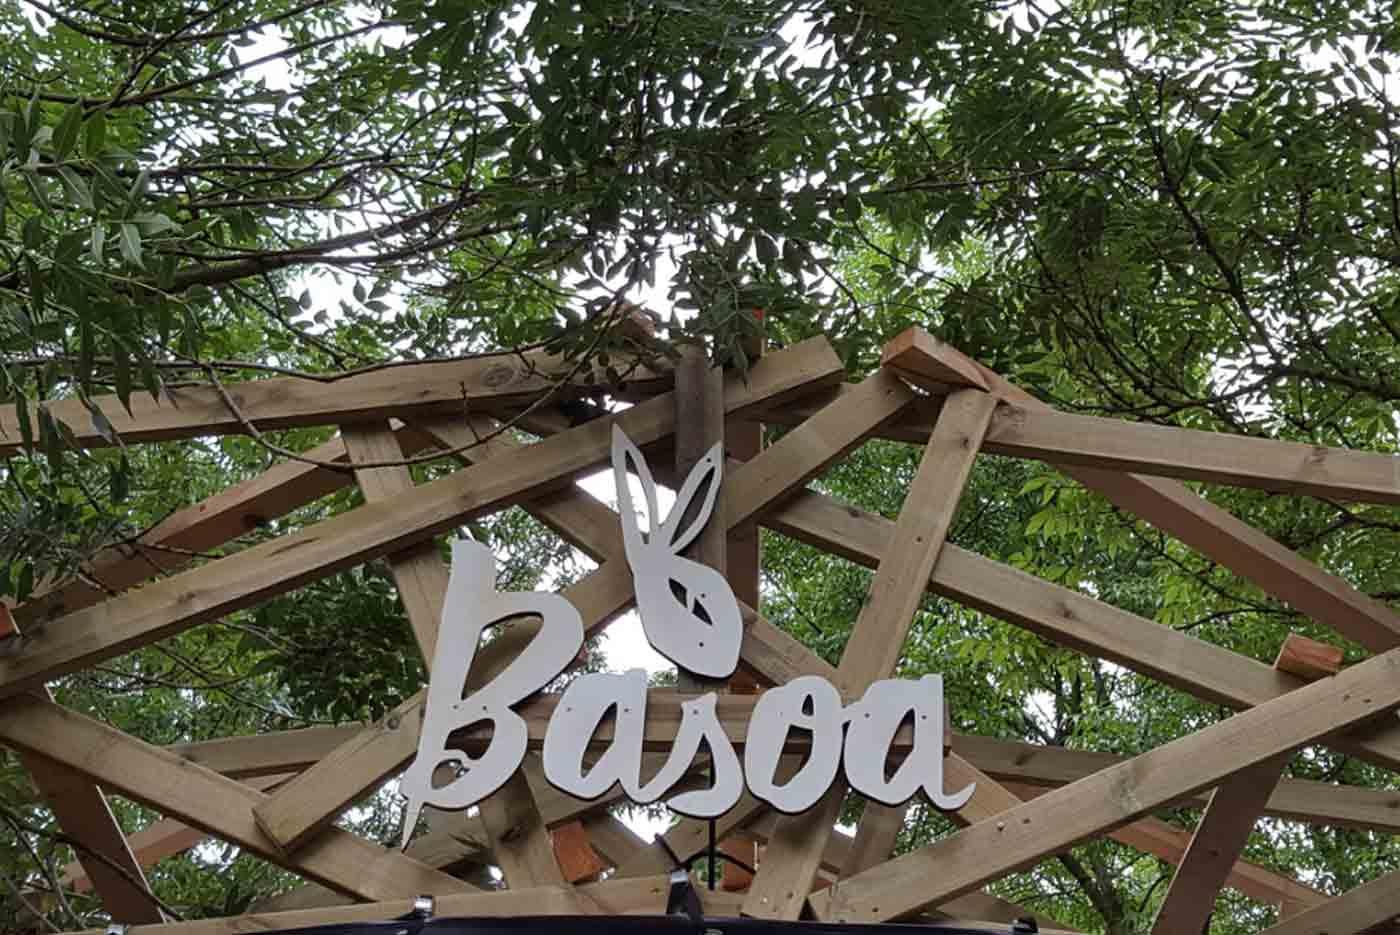 Basoa, rave en el bosque